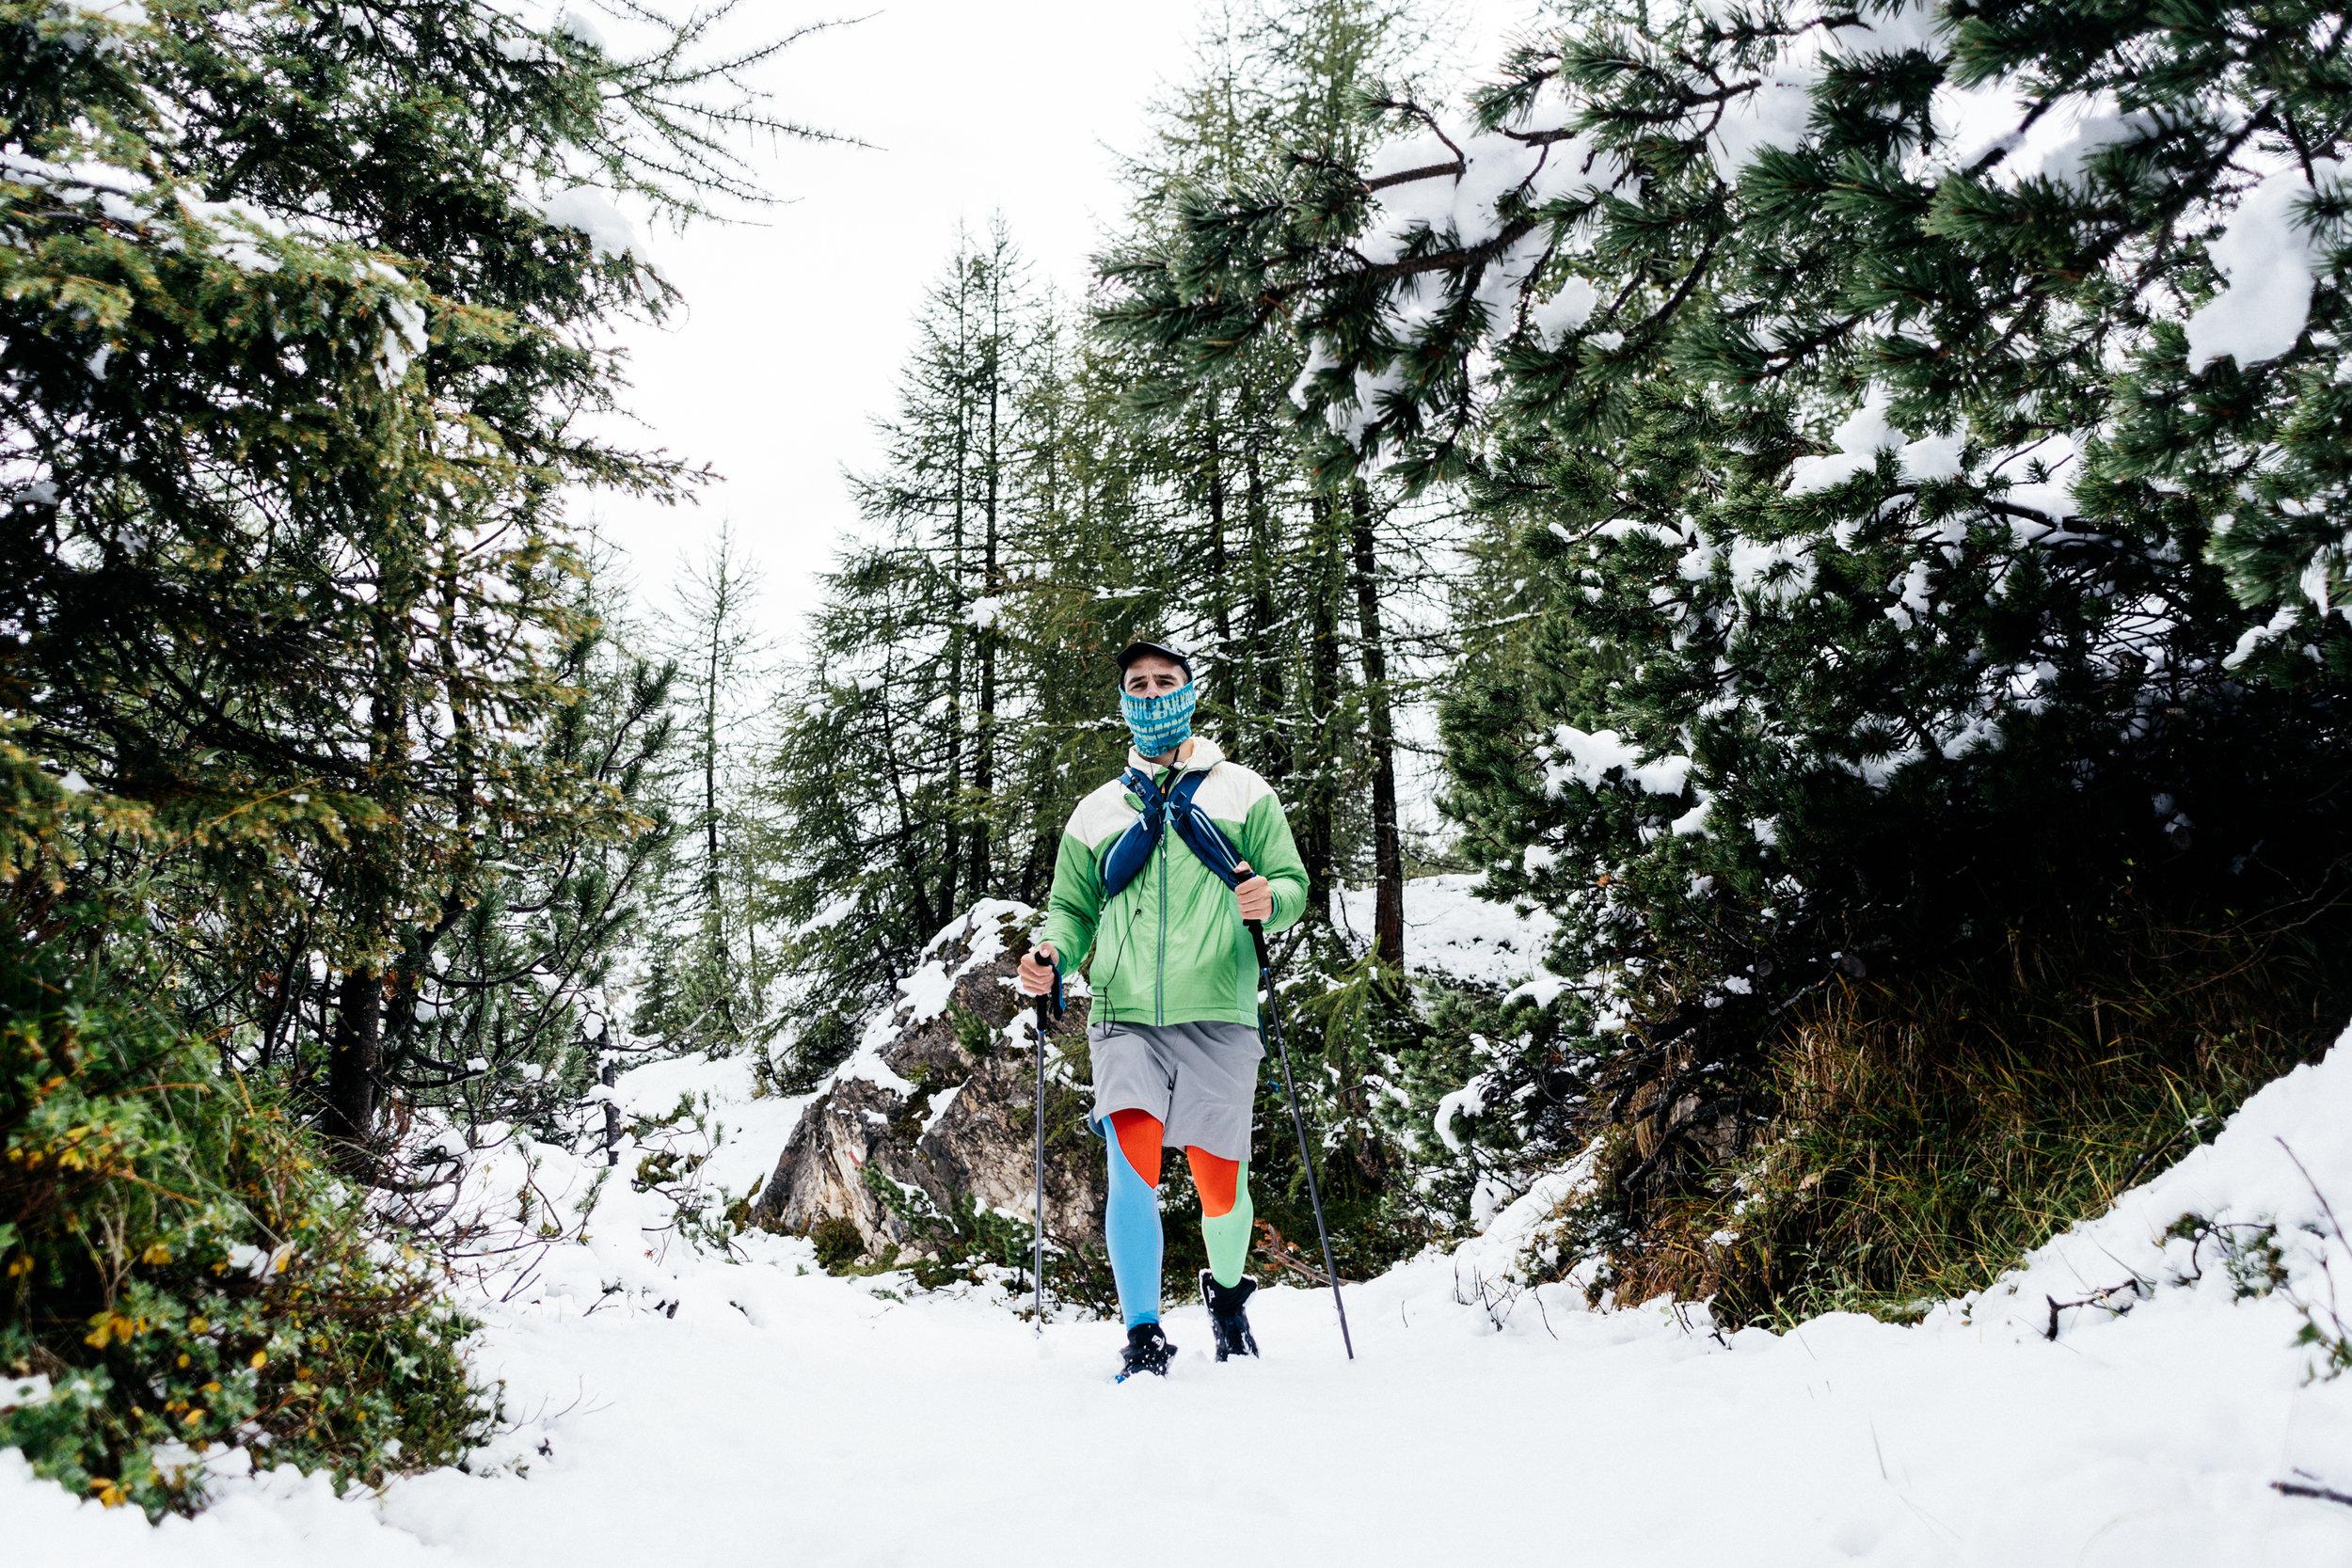 Dolomites-ChrisBrinleeJr-SEP17-100.jpg